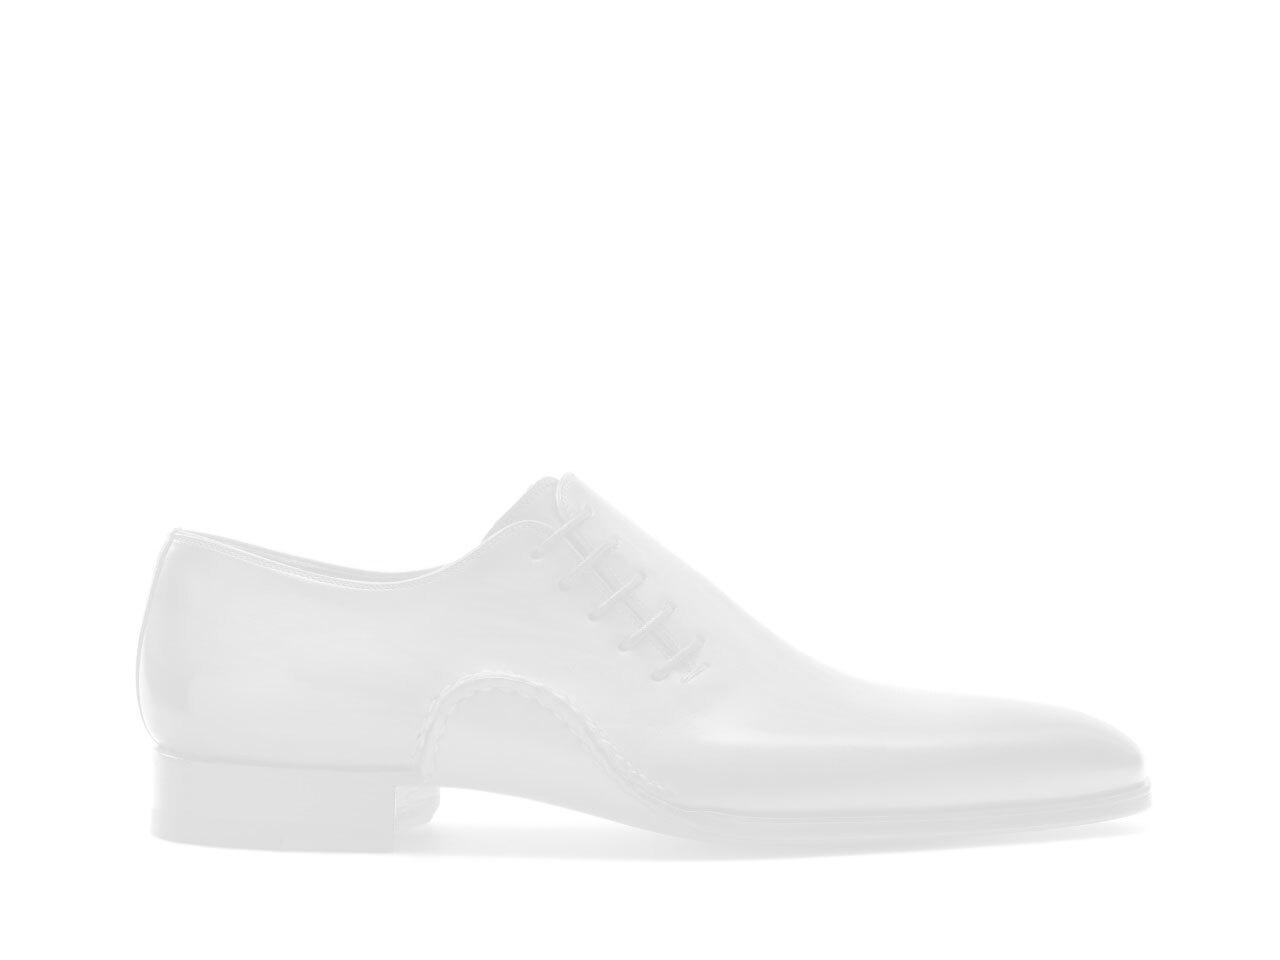 Ondara II Monk Strap shoe by Magnanni